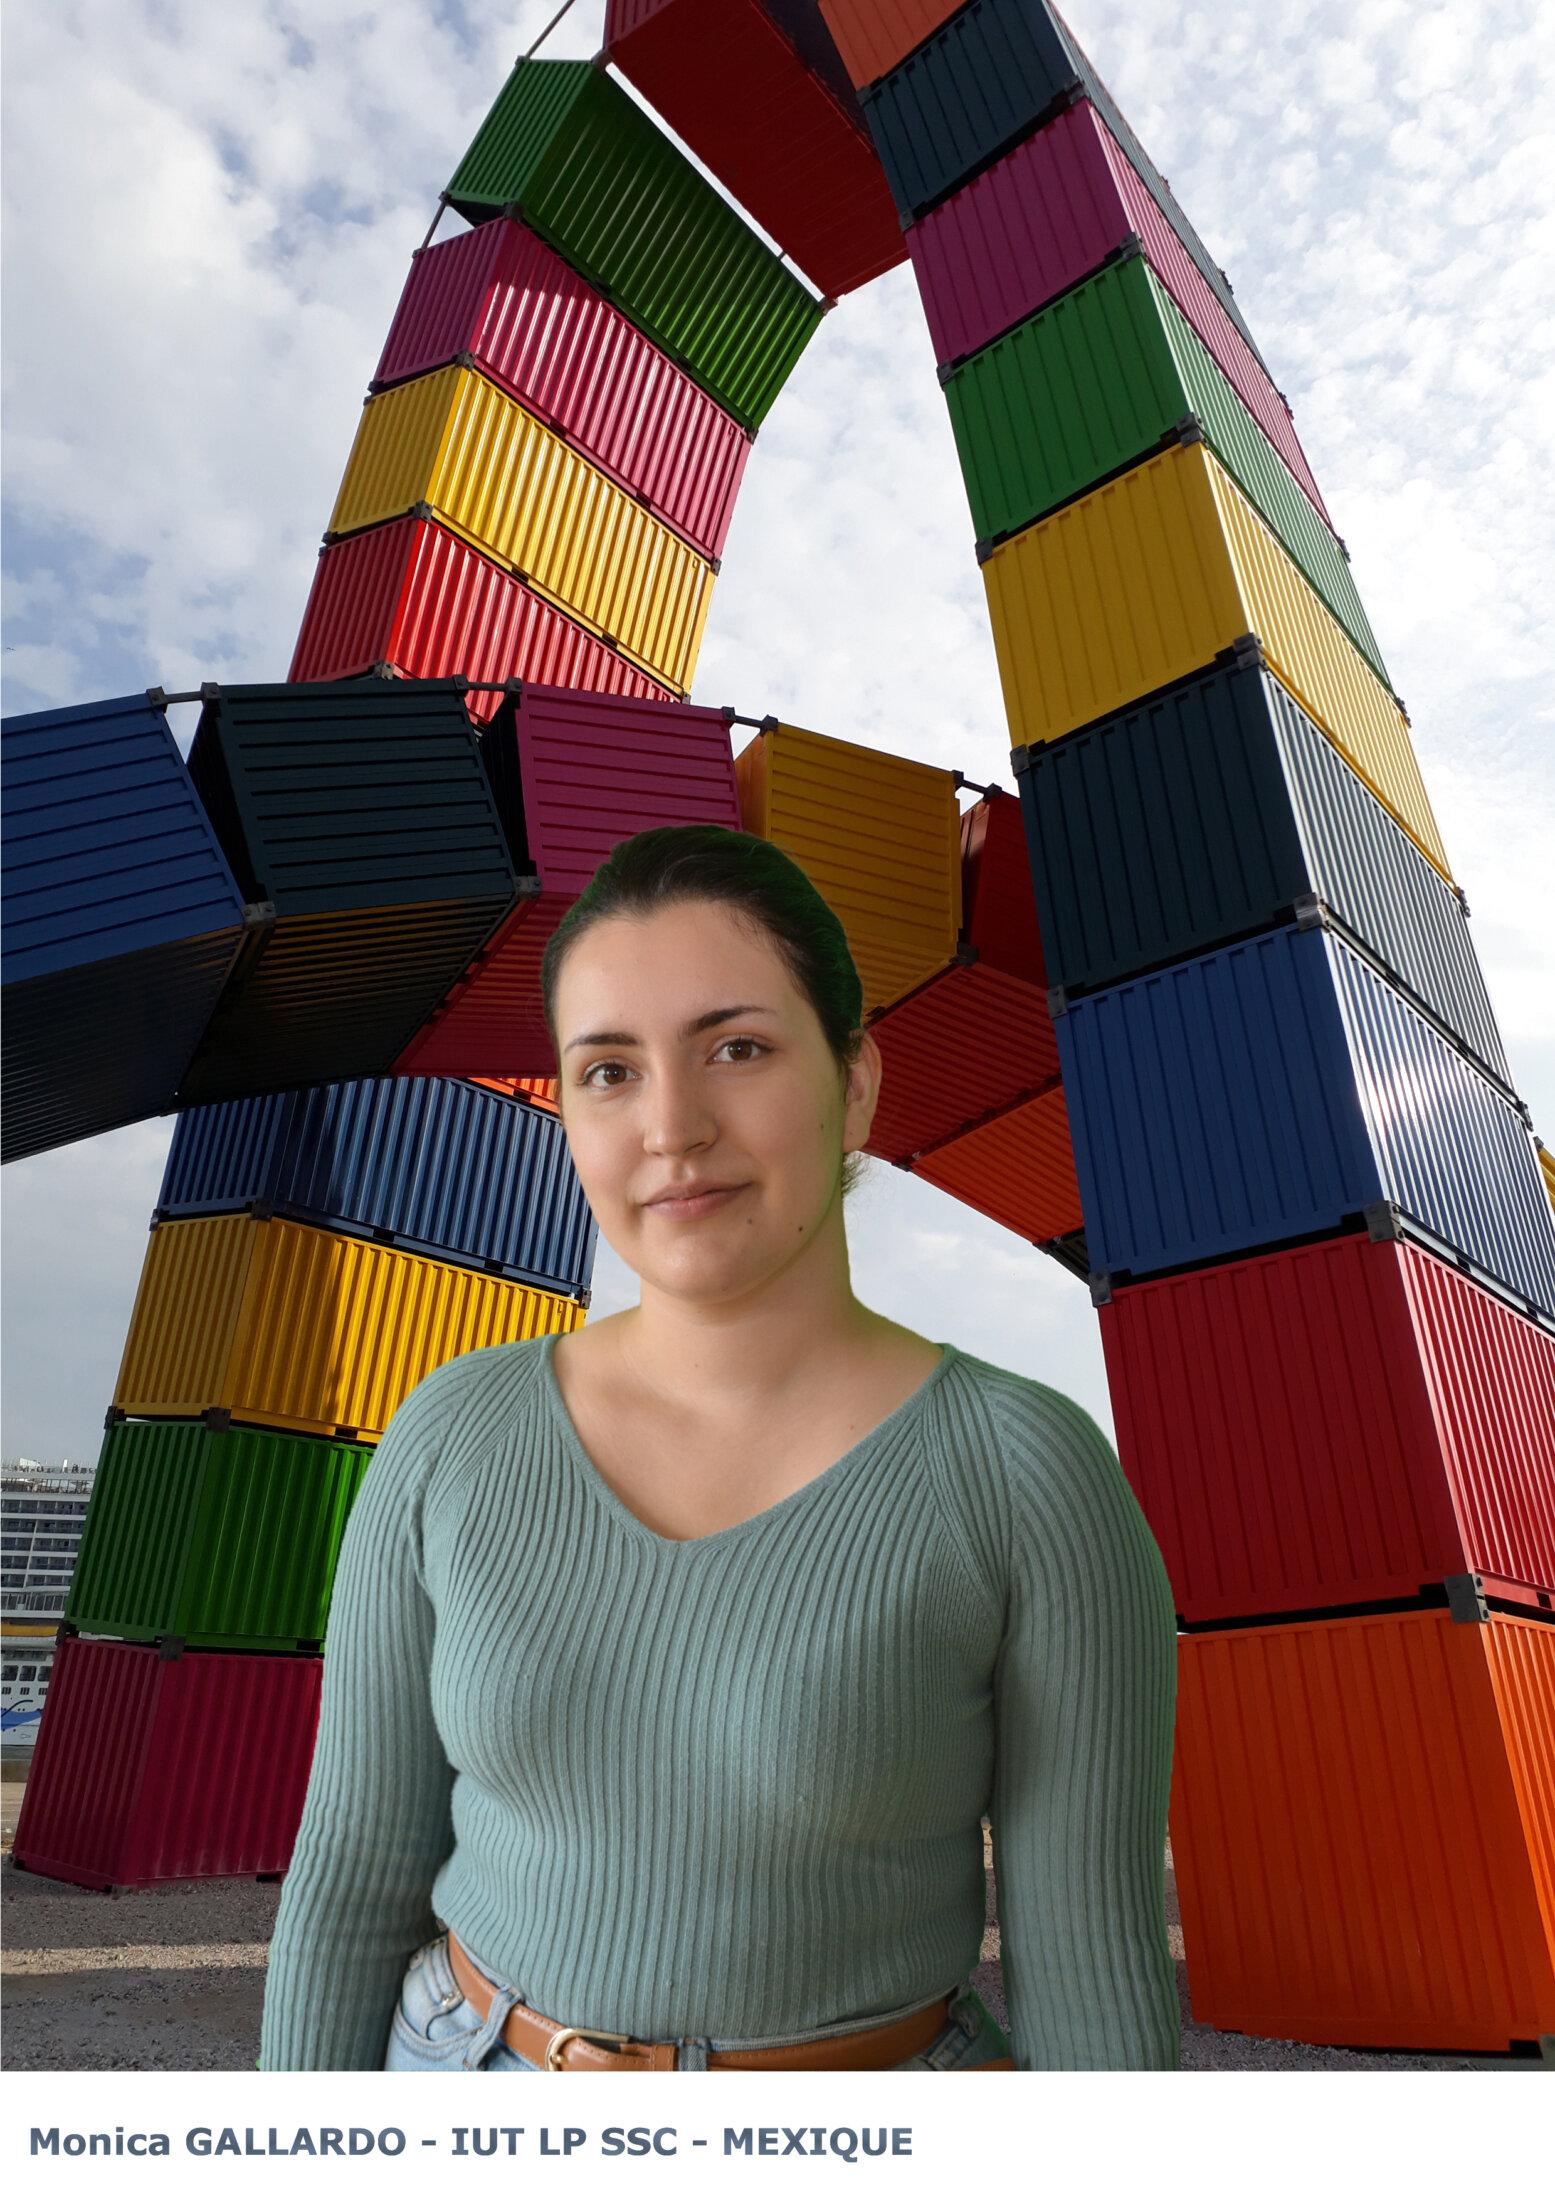 Monica GALLARDO Catène